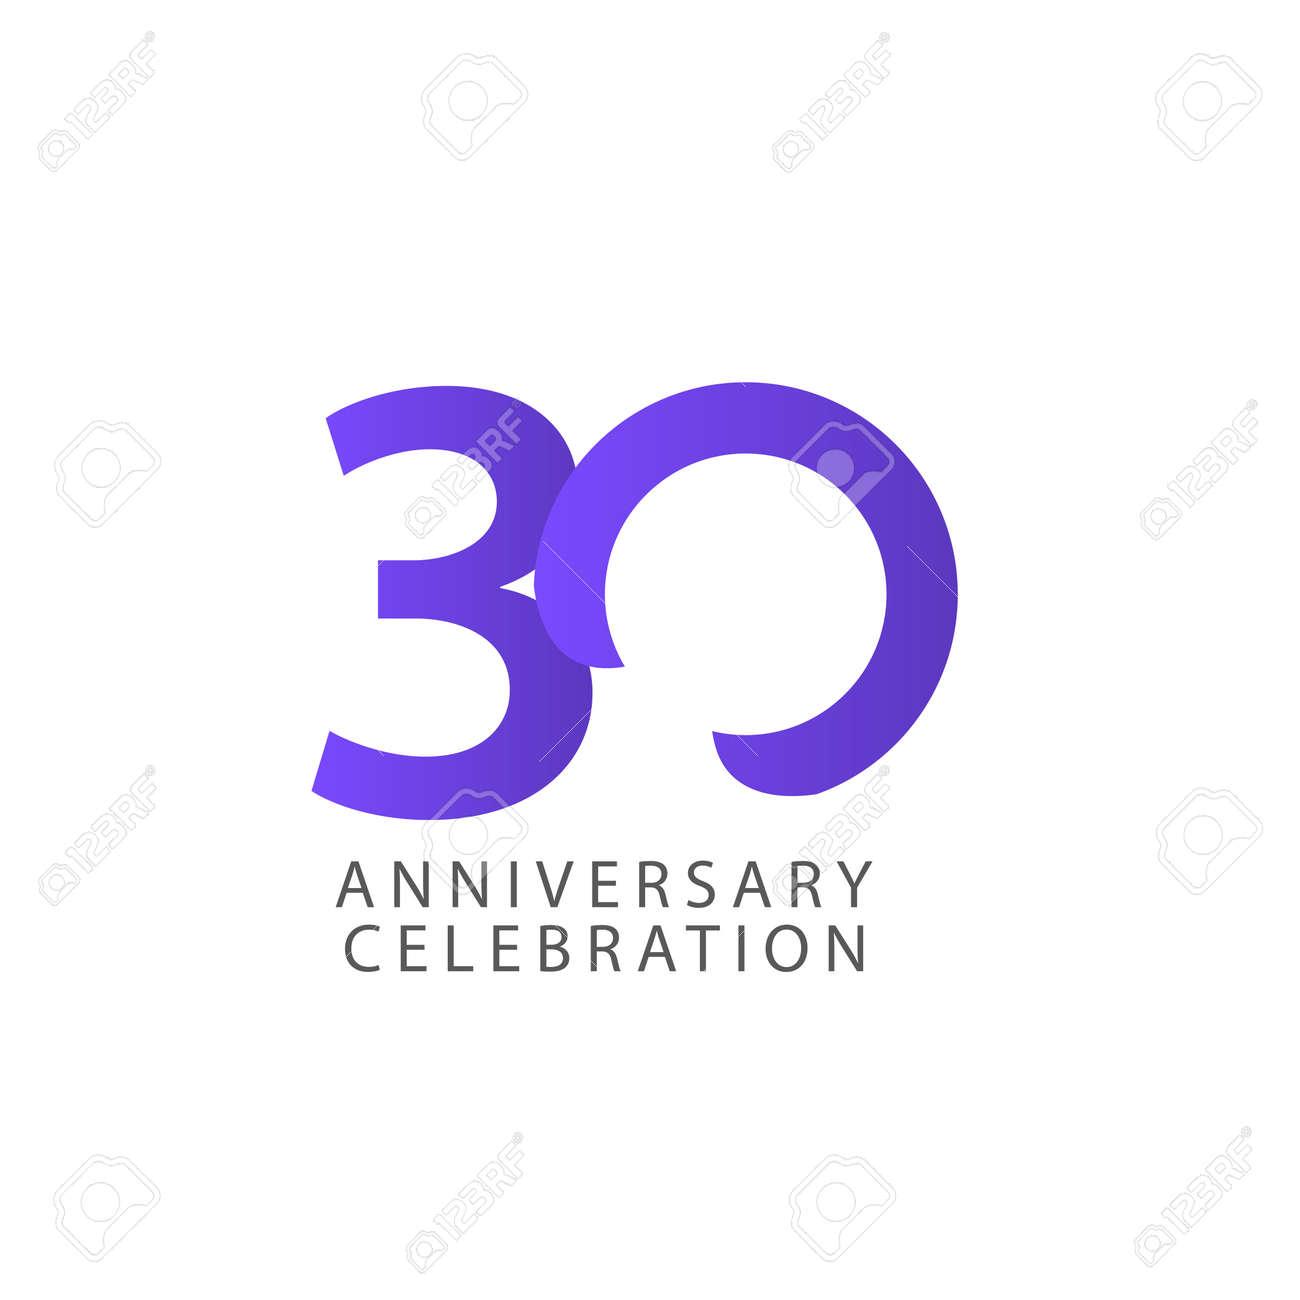 30 Years Anniversary Celebration Vector Template Design Illustration - 163698159